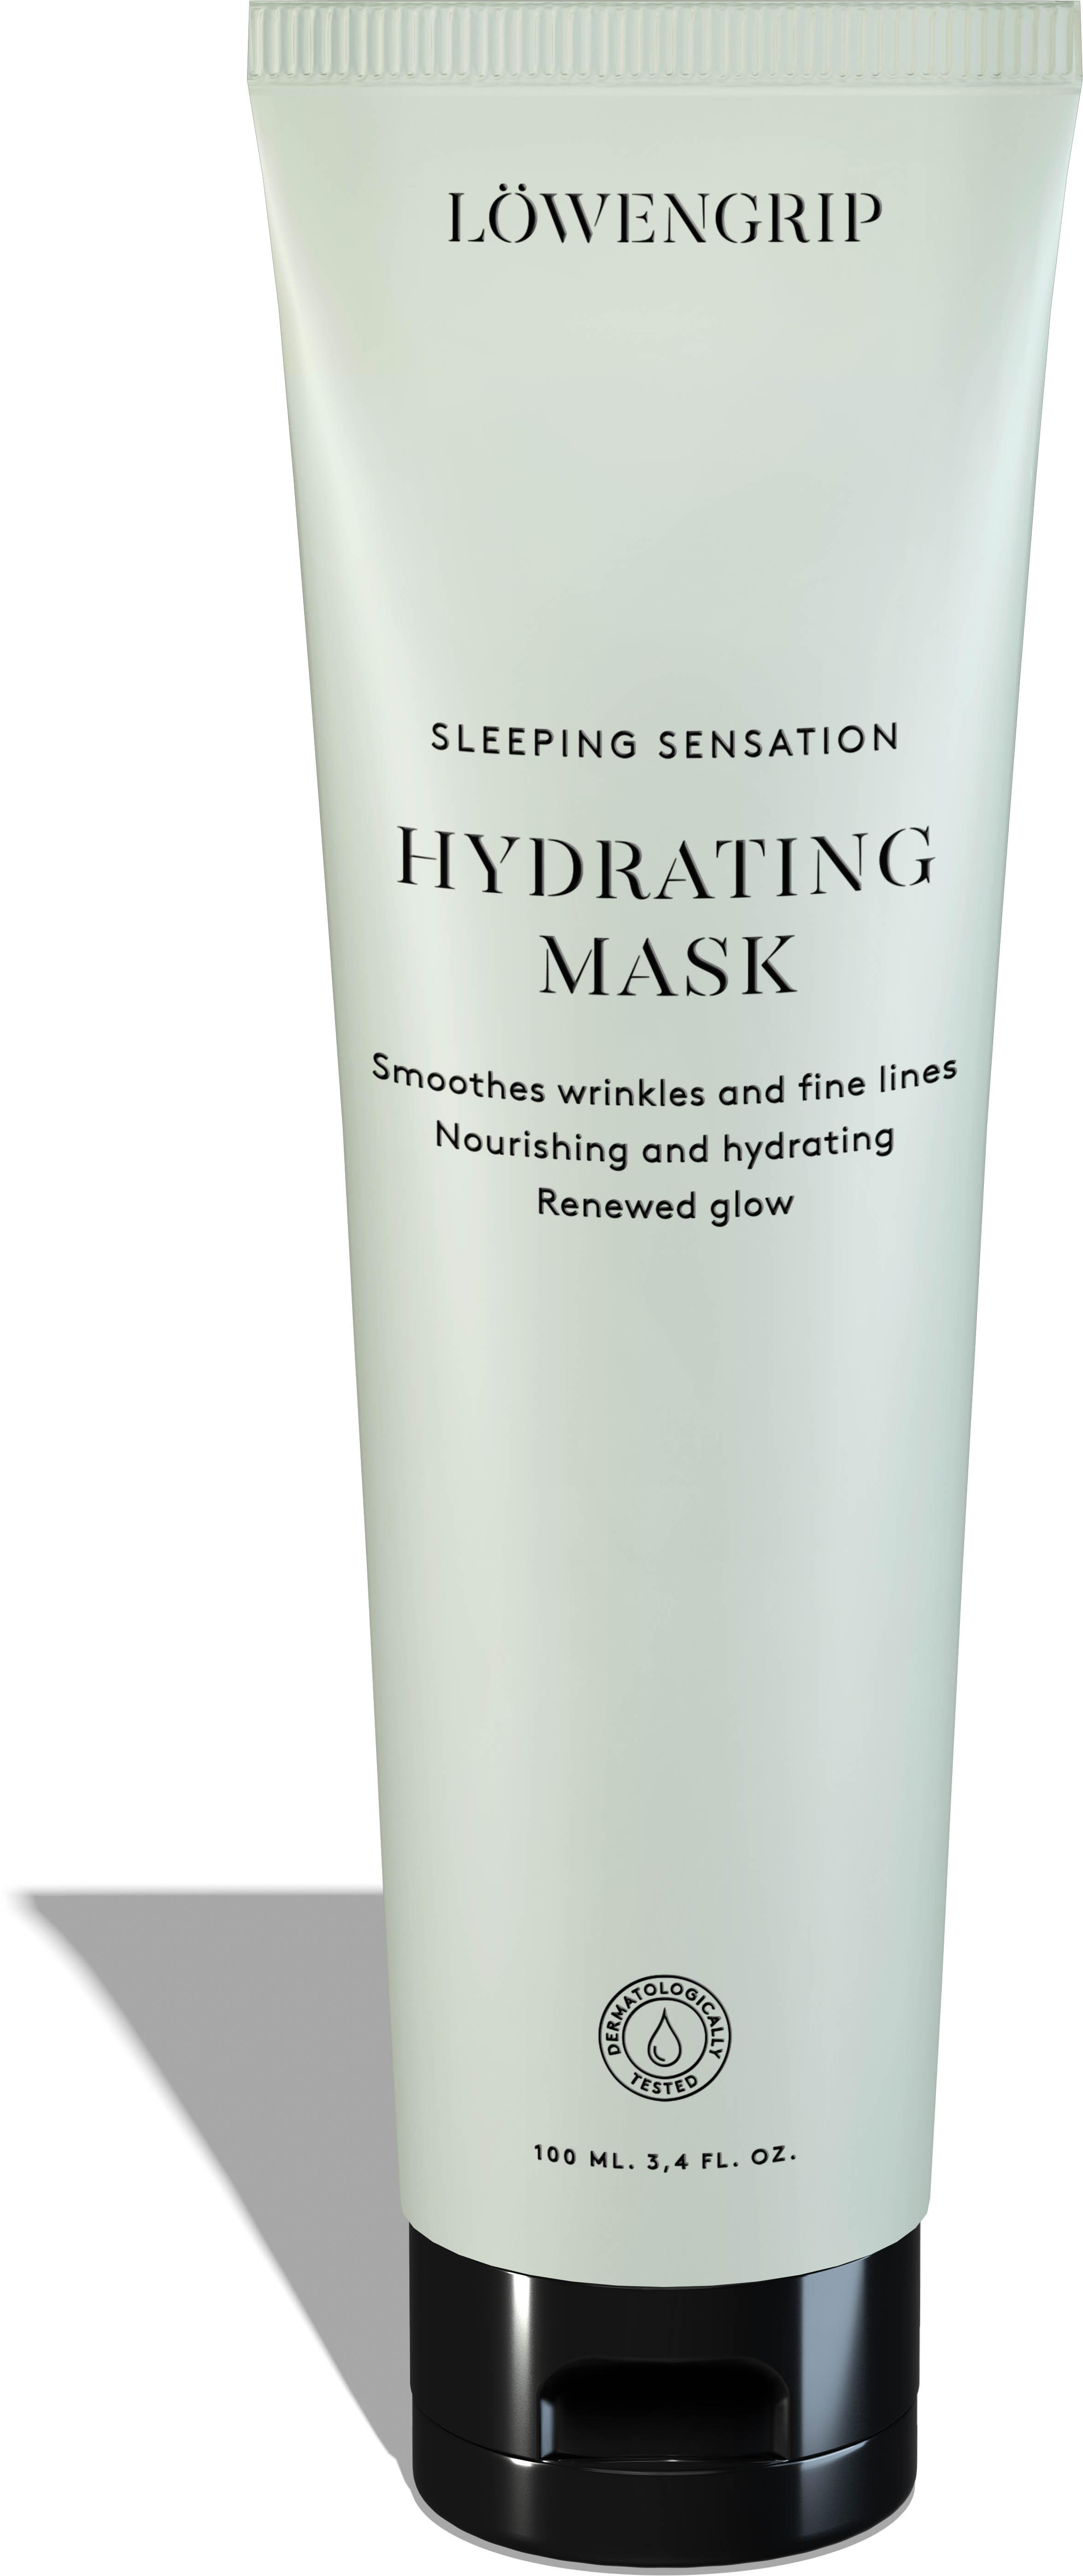 Sleeping Sensation - Hydrating Mask 100ml